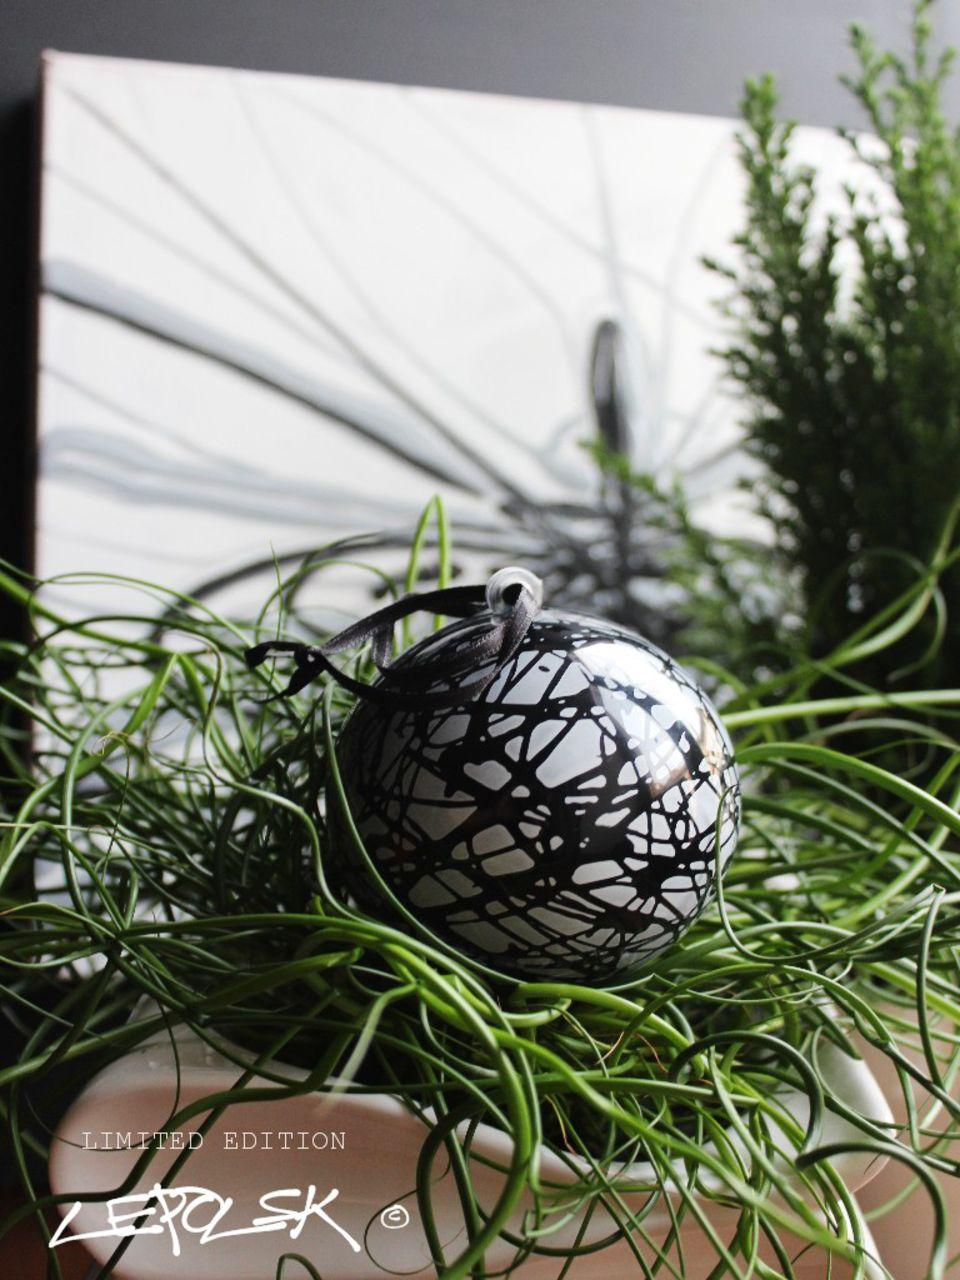 LEPOLSK MATUSZEWSKI DRIPPING  La boule de Noël Lepolsk Matuszewski